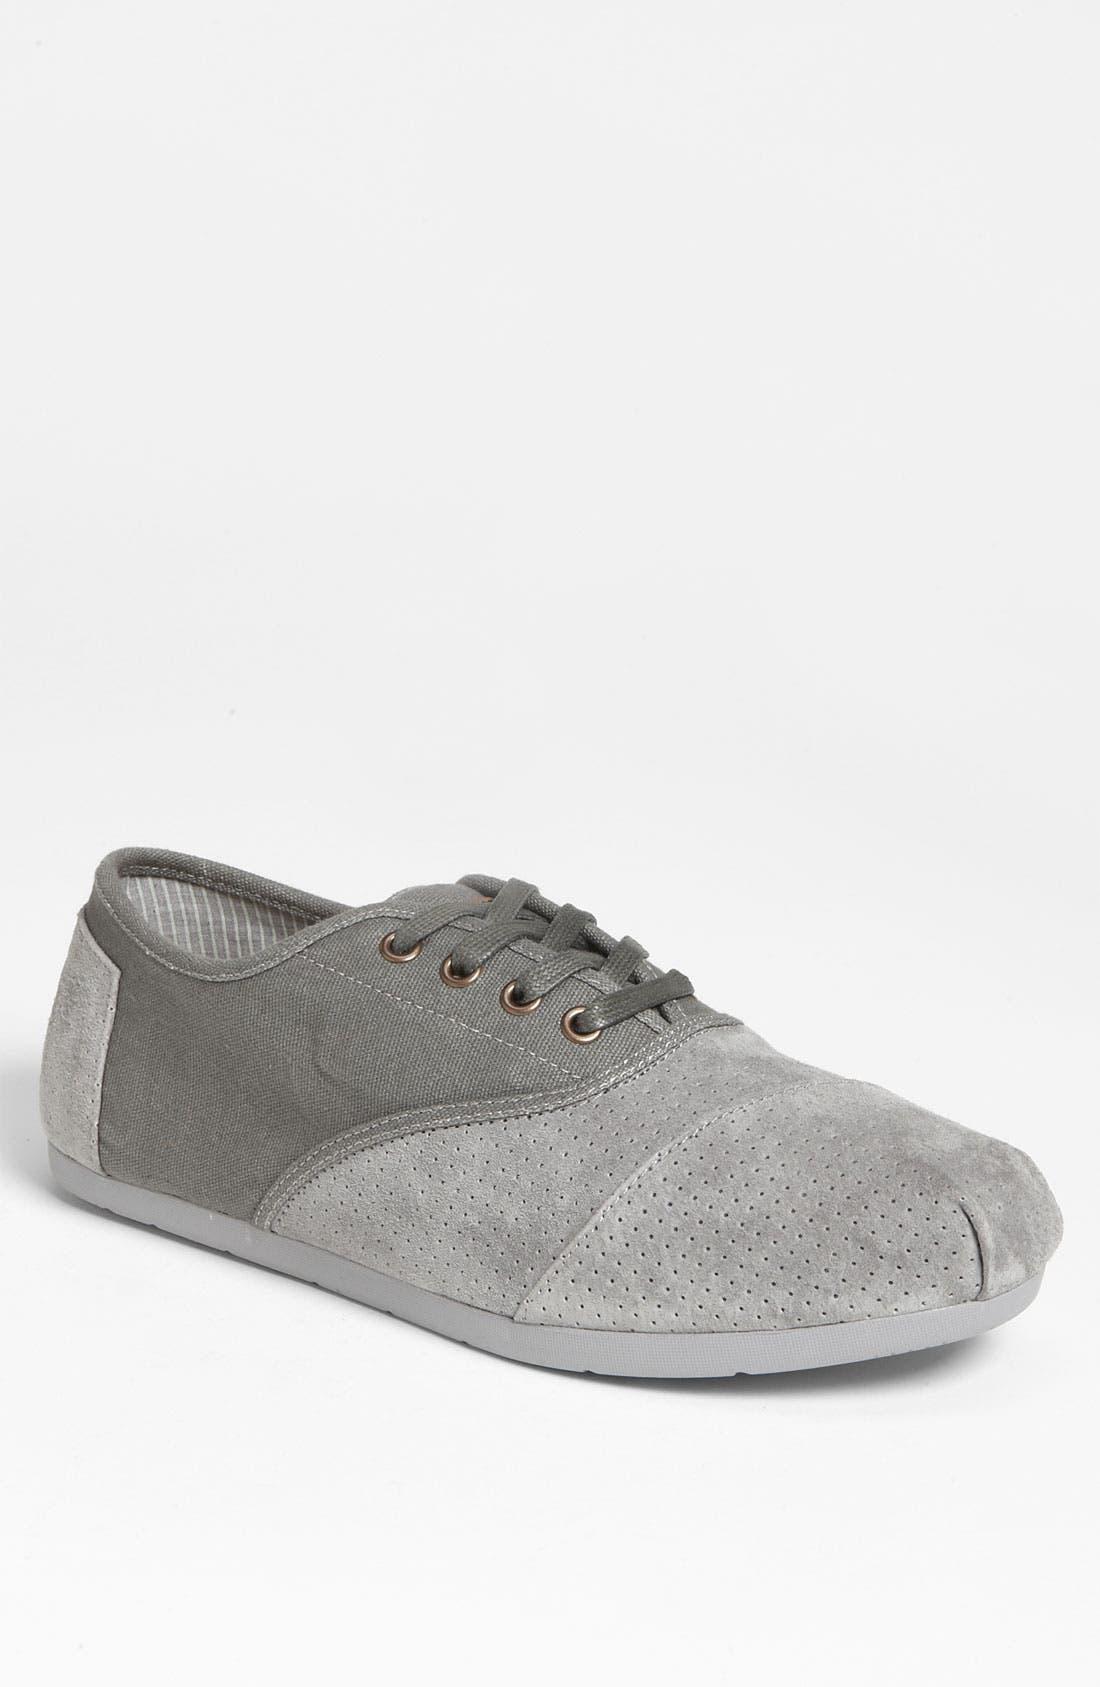 Main Image - TOMS 'Cordones - Marquez' Sneaker (Men)